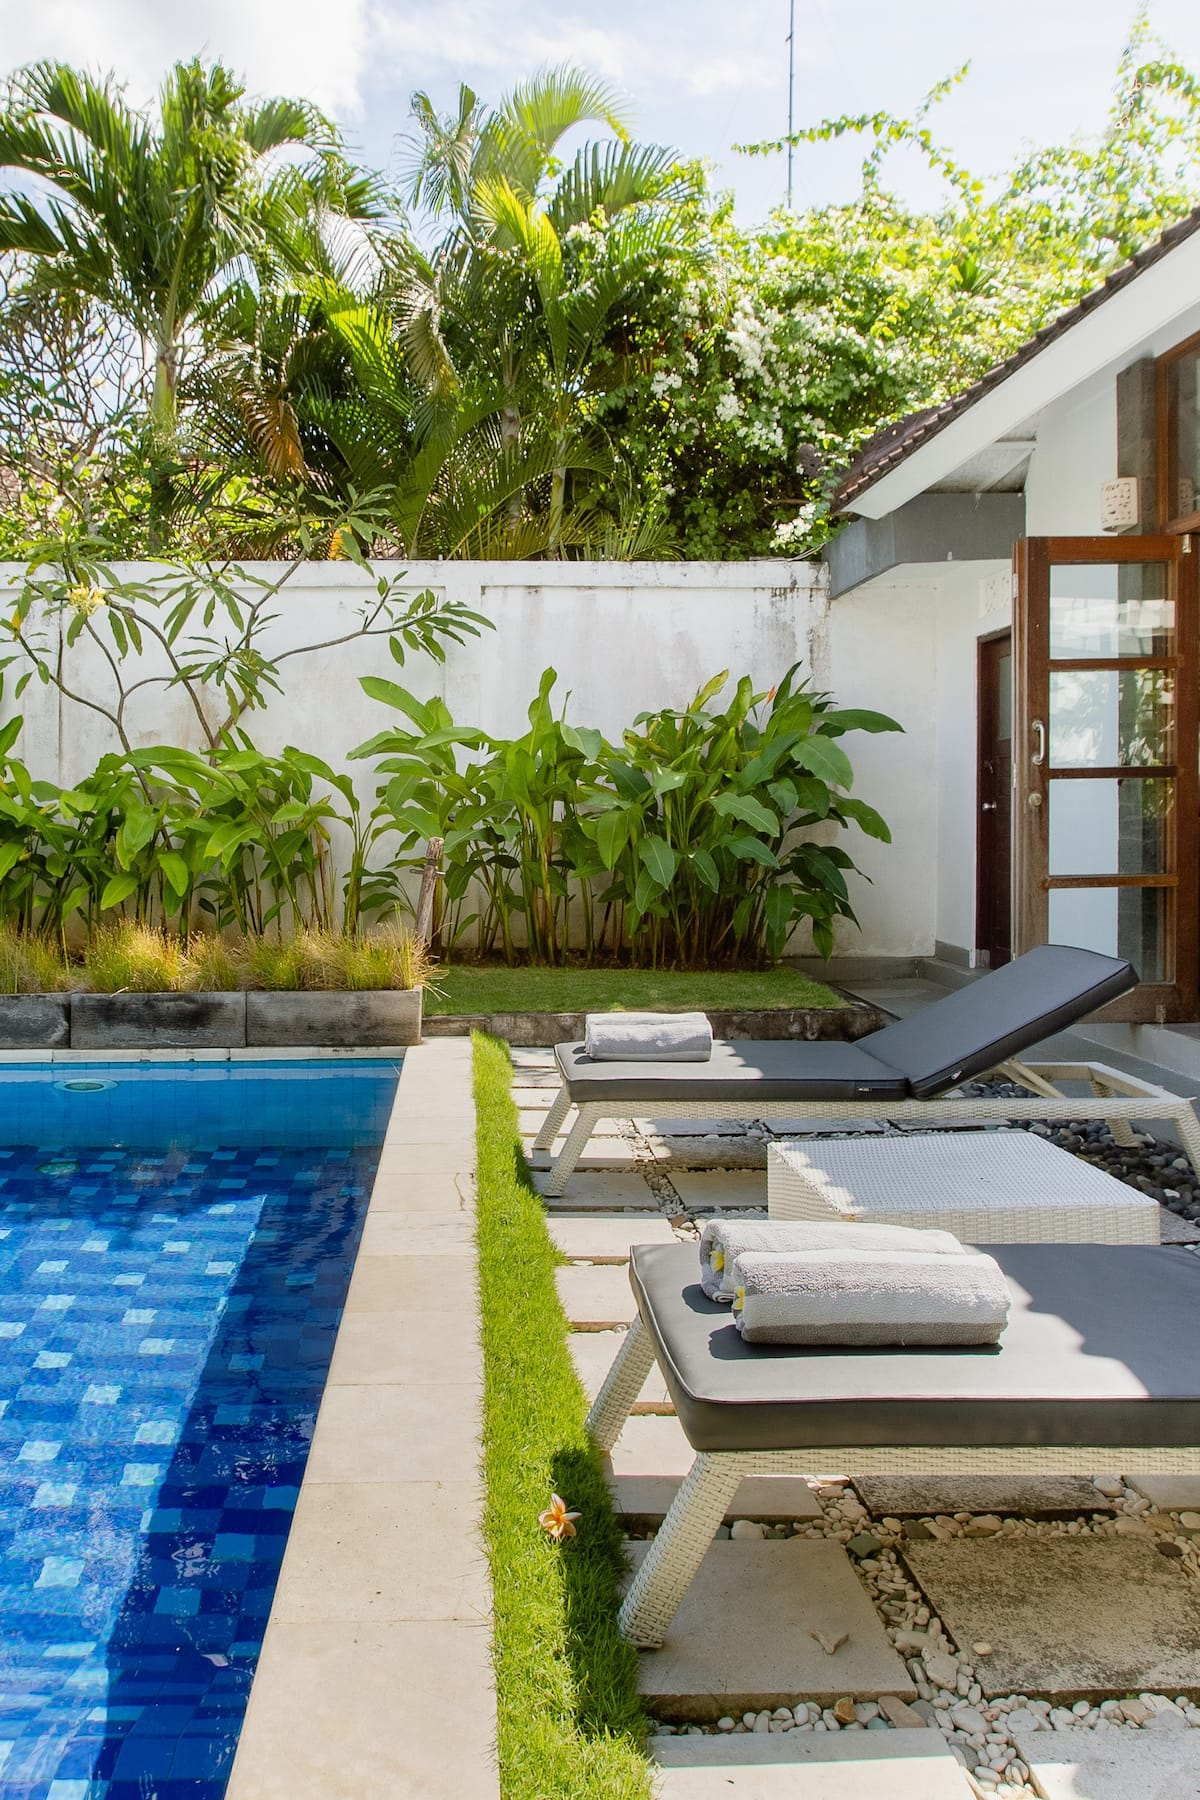 Airbnb Jl Dewi Saraswati Iii No5 Vacation Rentals